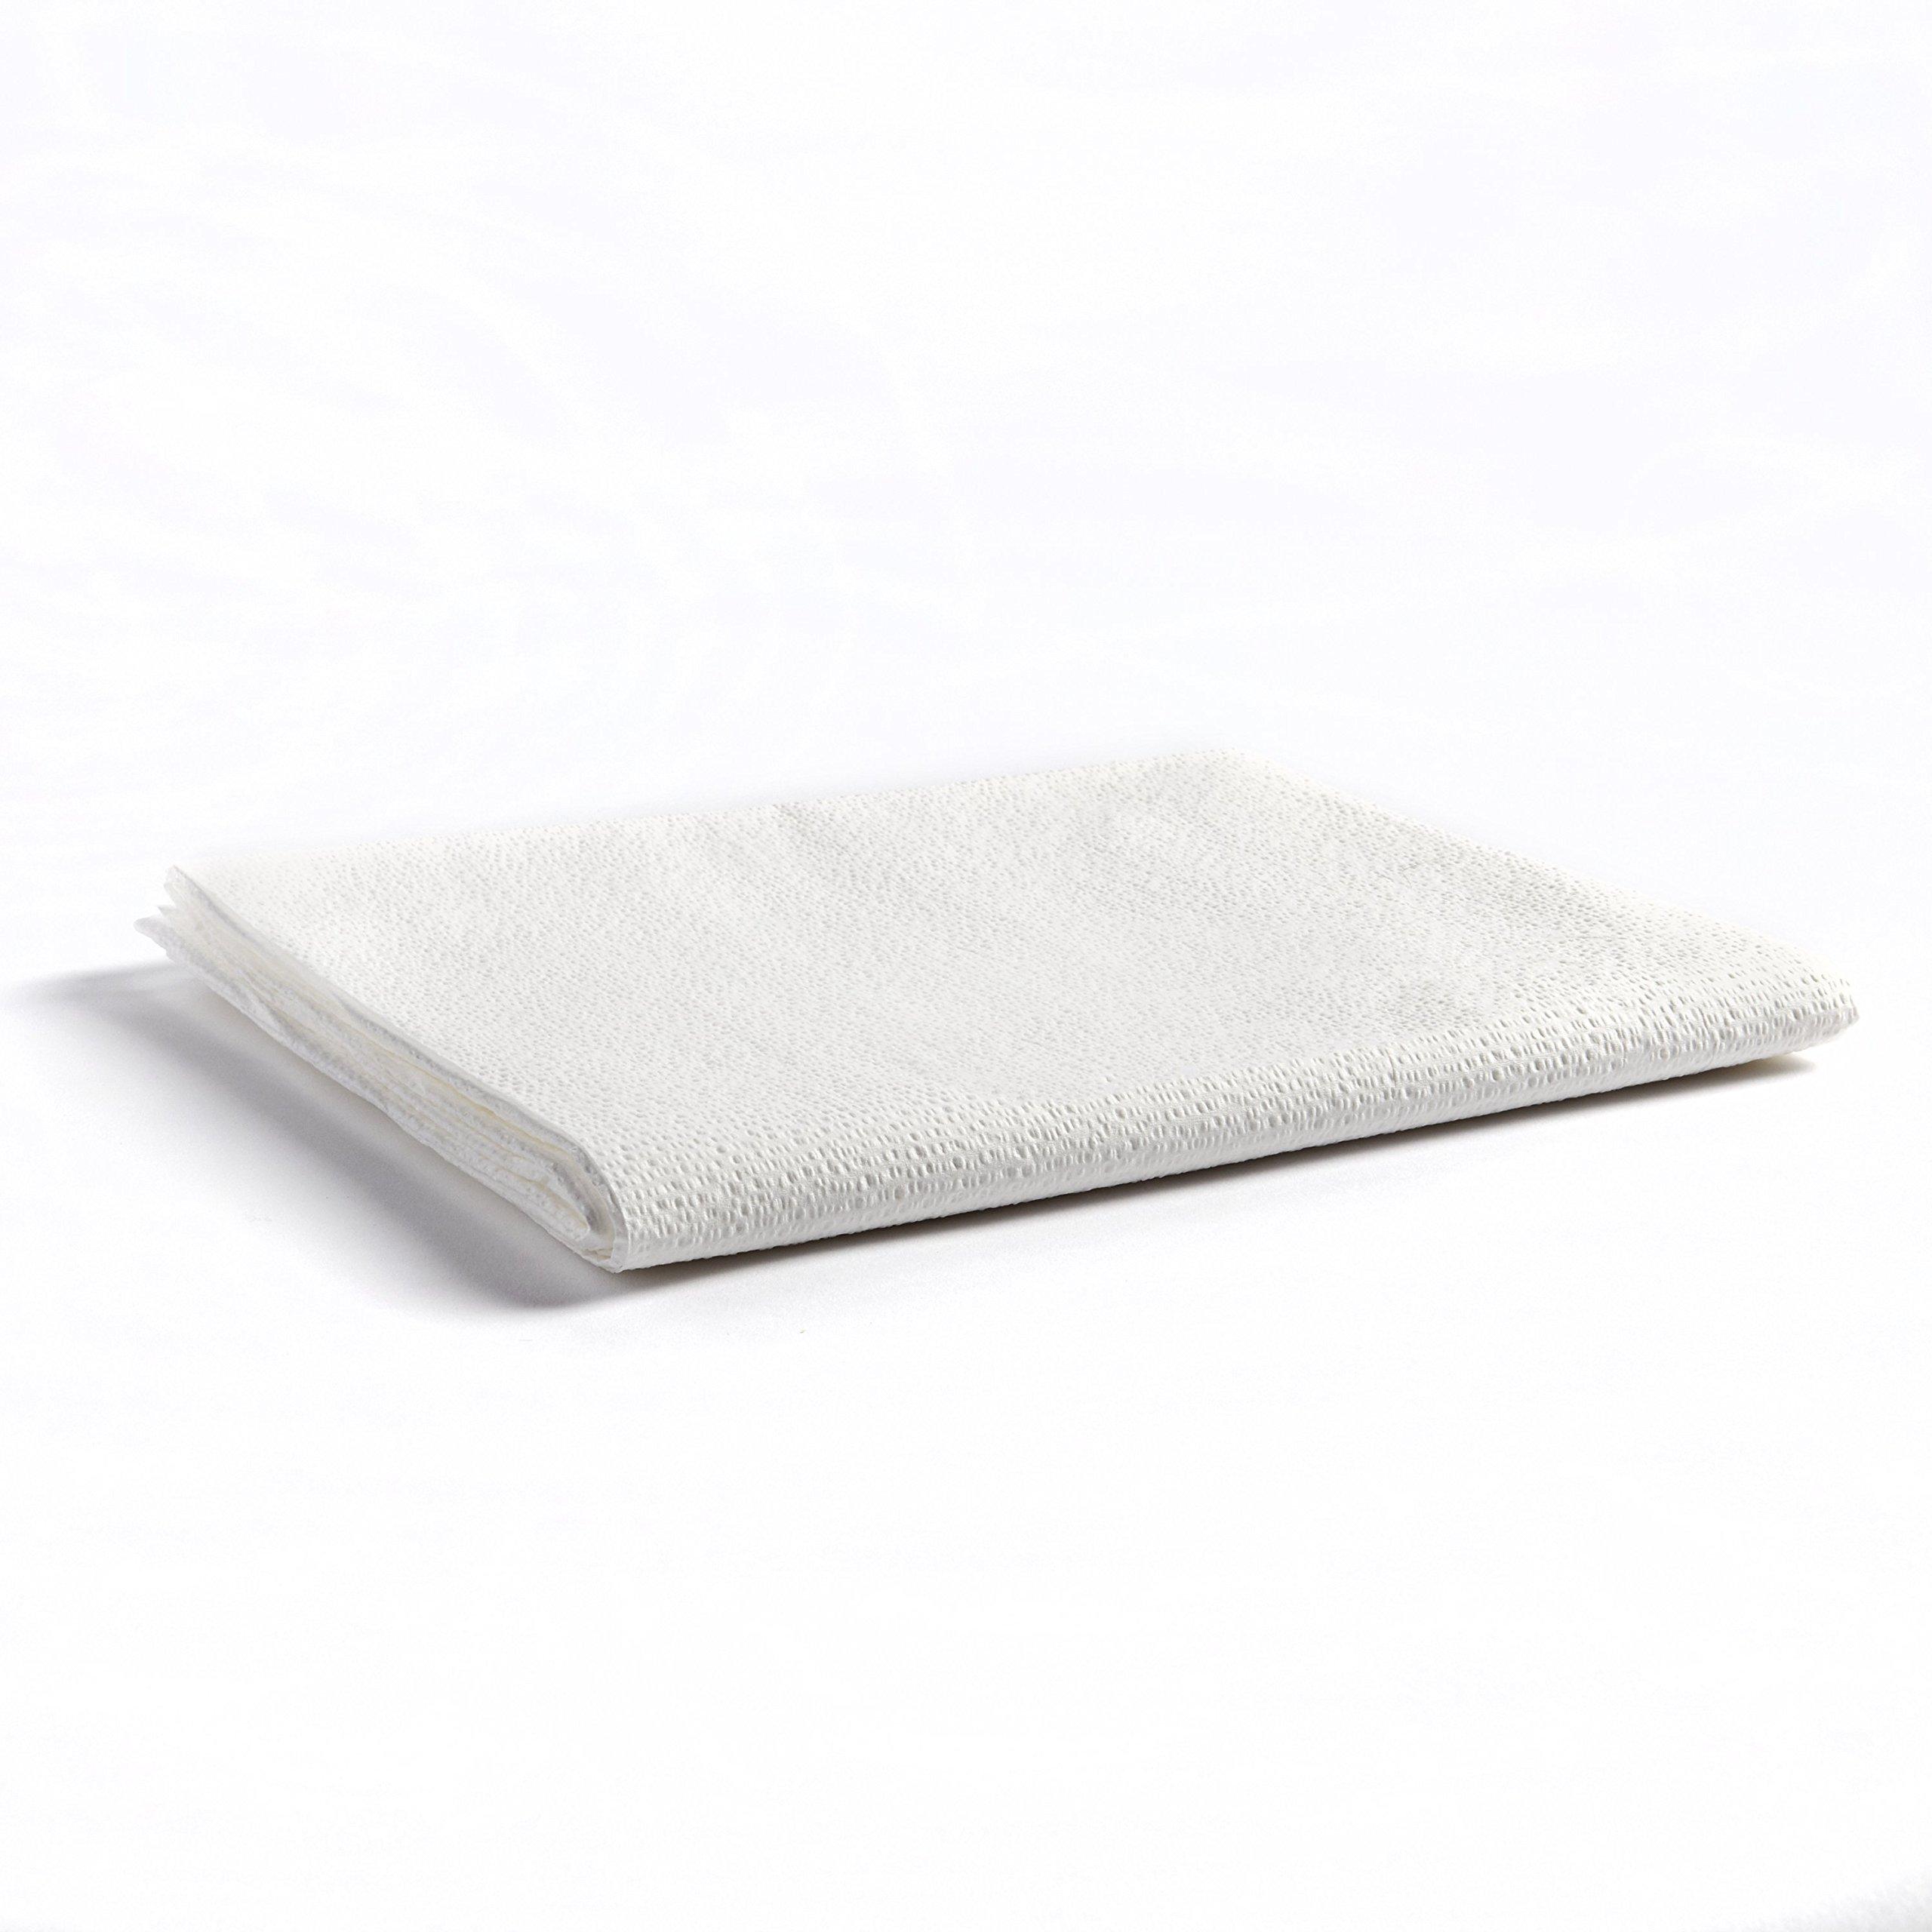 Graham Beauty Spa Essentials, 43656, Drape Sheet, Tissue, White, Shape,, (Pack of 50)